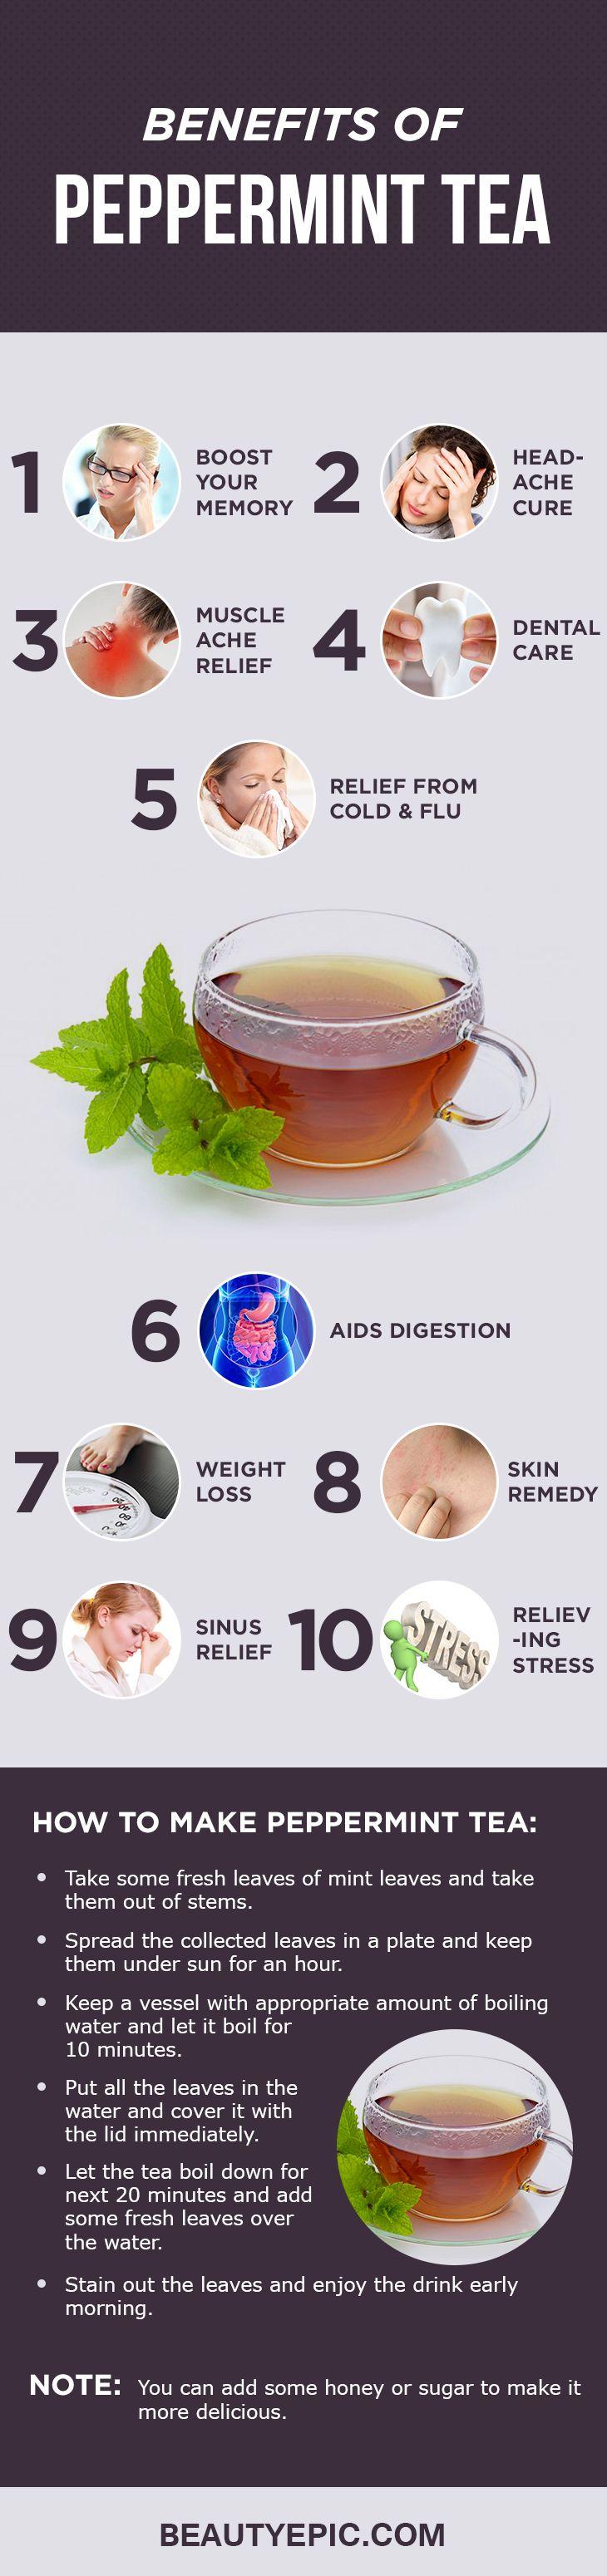 12 Amazing Health Benefits of Drinking Peppermint Tea